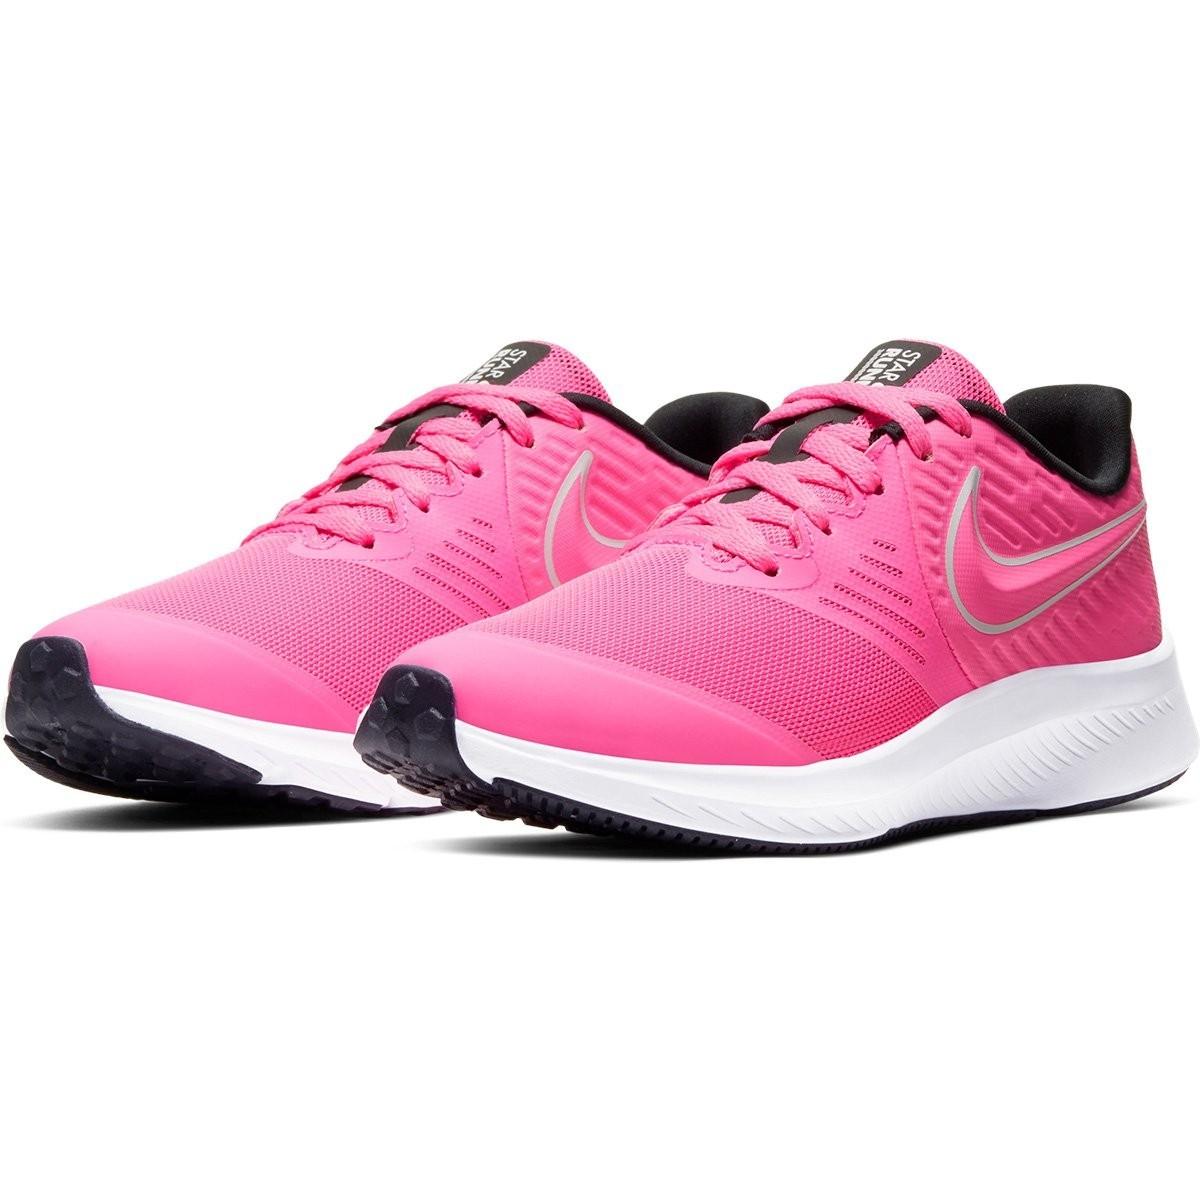 Tenis Nike Star Runner 2 Feminino Esportivo Juvenil